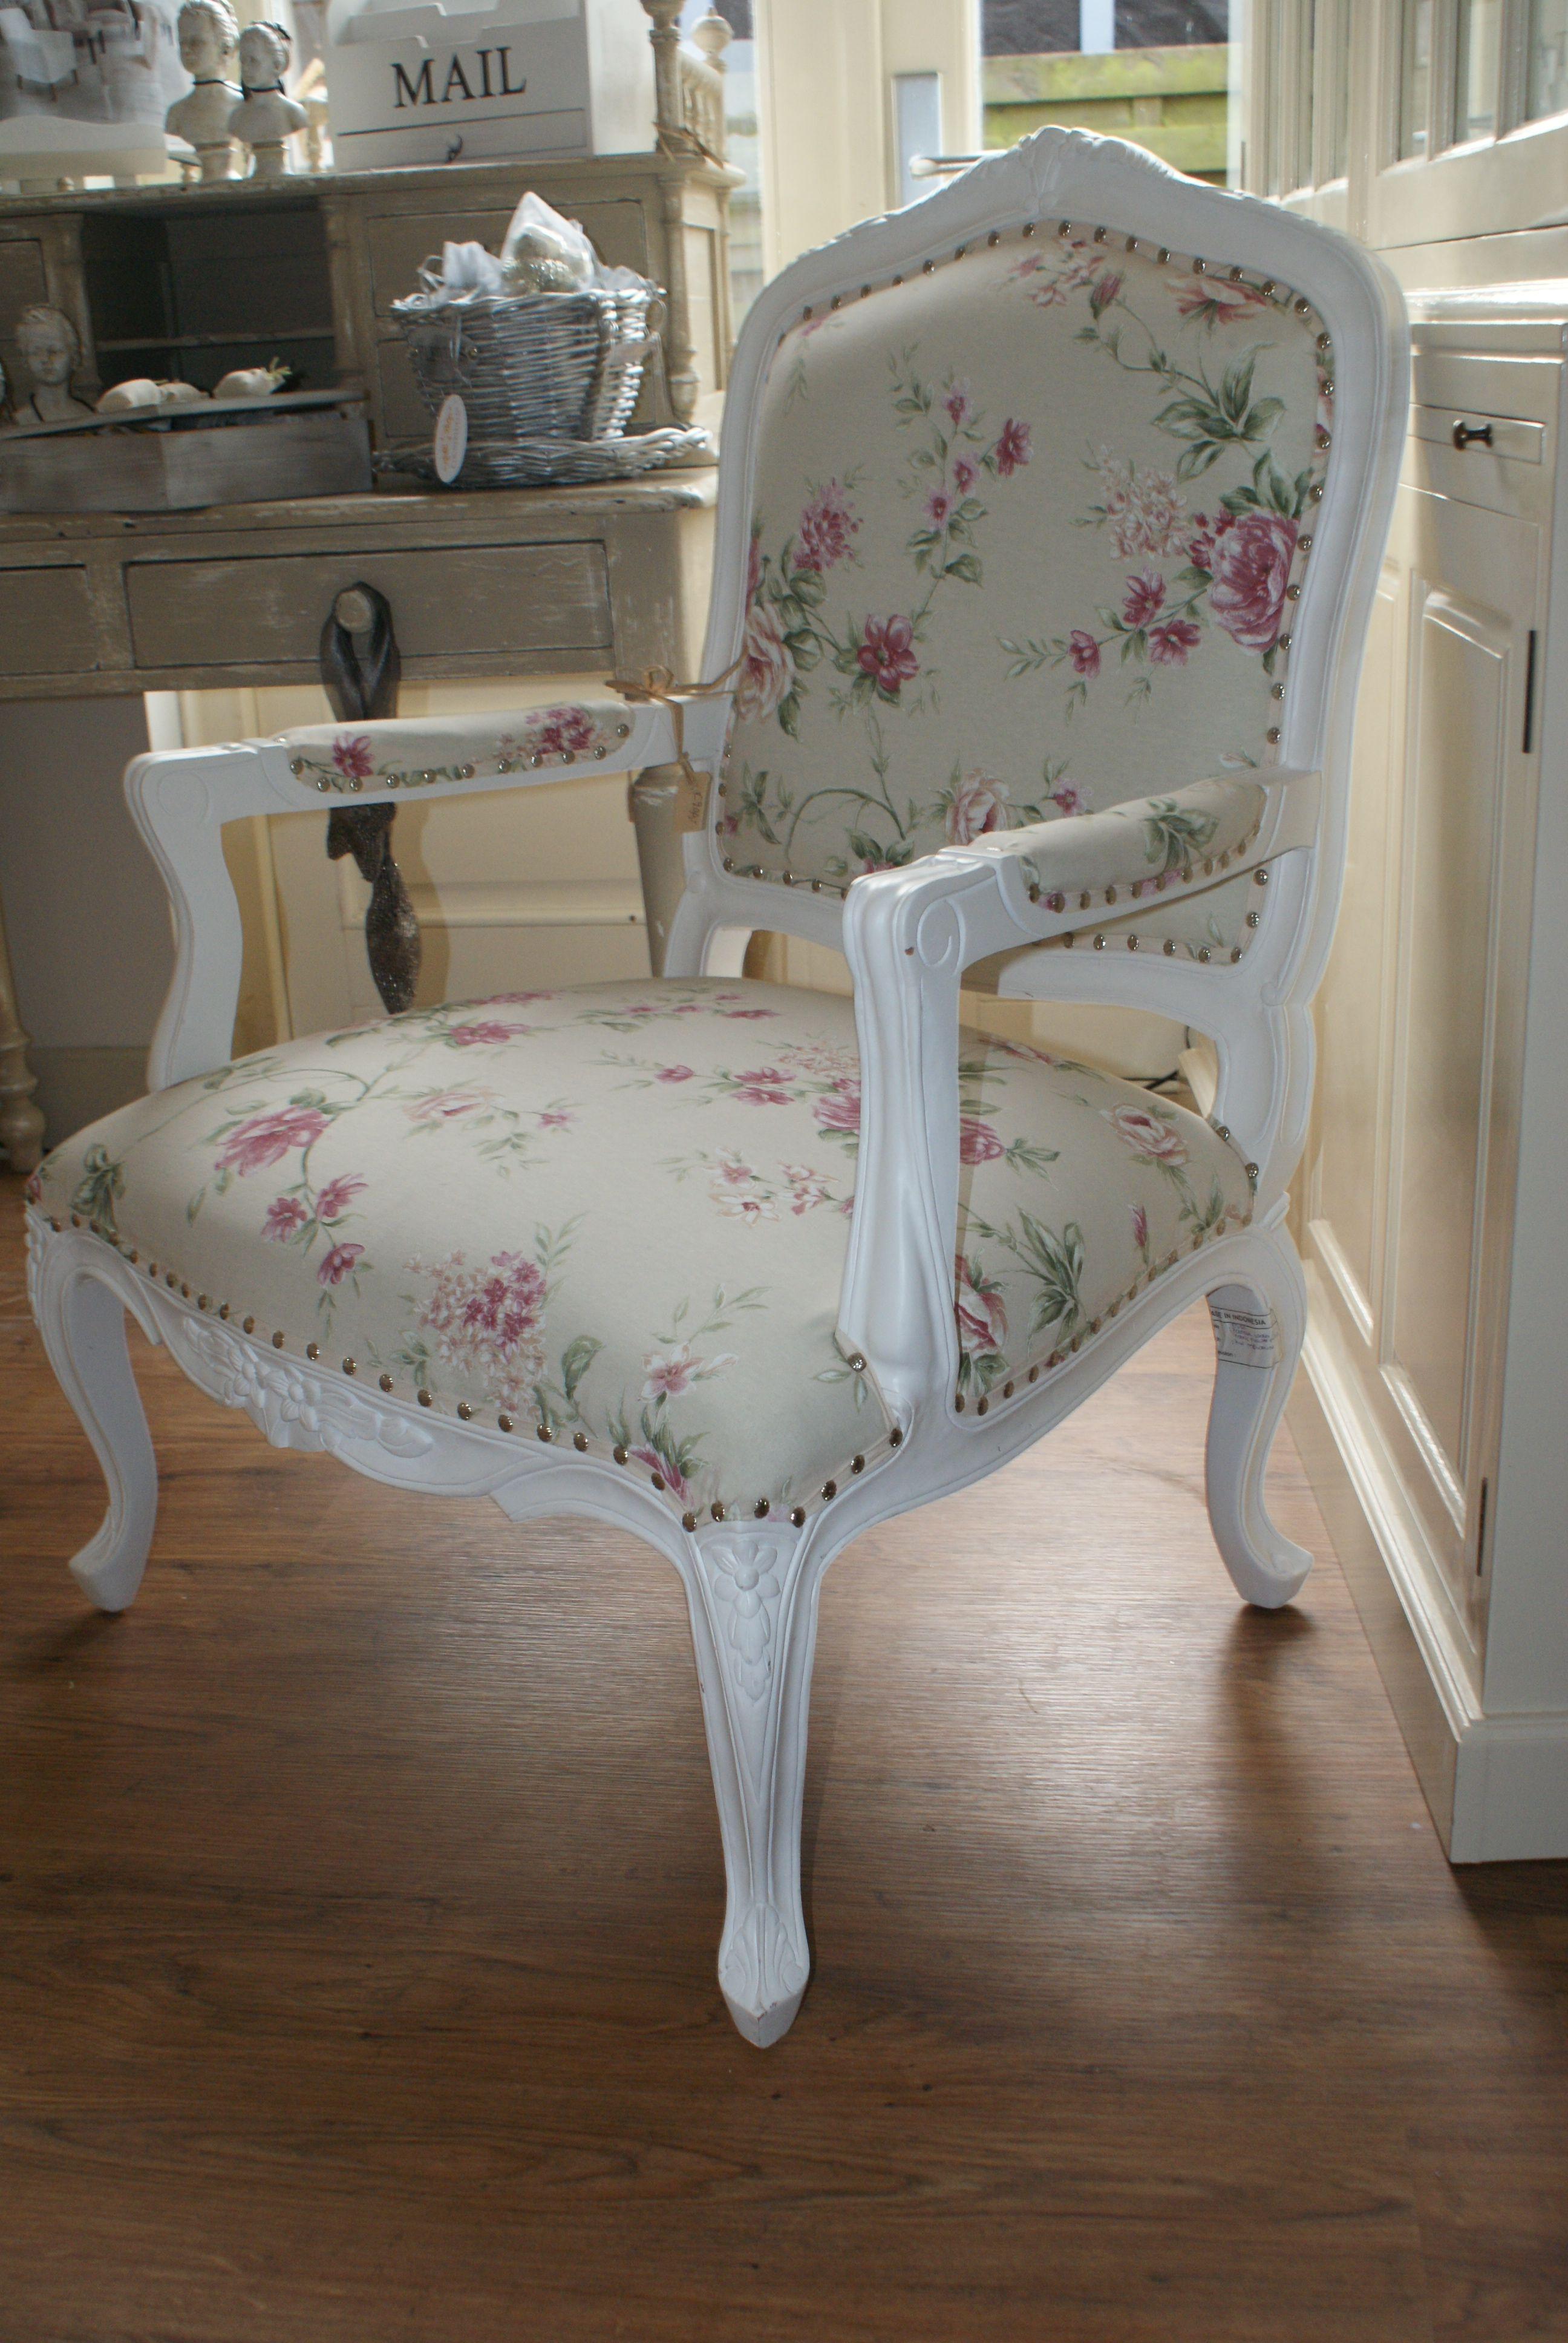 Fauteuil With Flower Fabric Armchair Louis Xv Style Fauteuil Deco Diy Fauteuil Deco Interieure